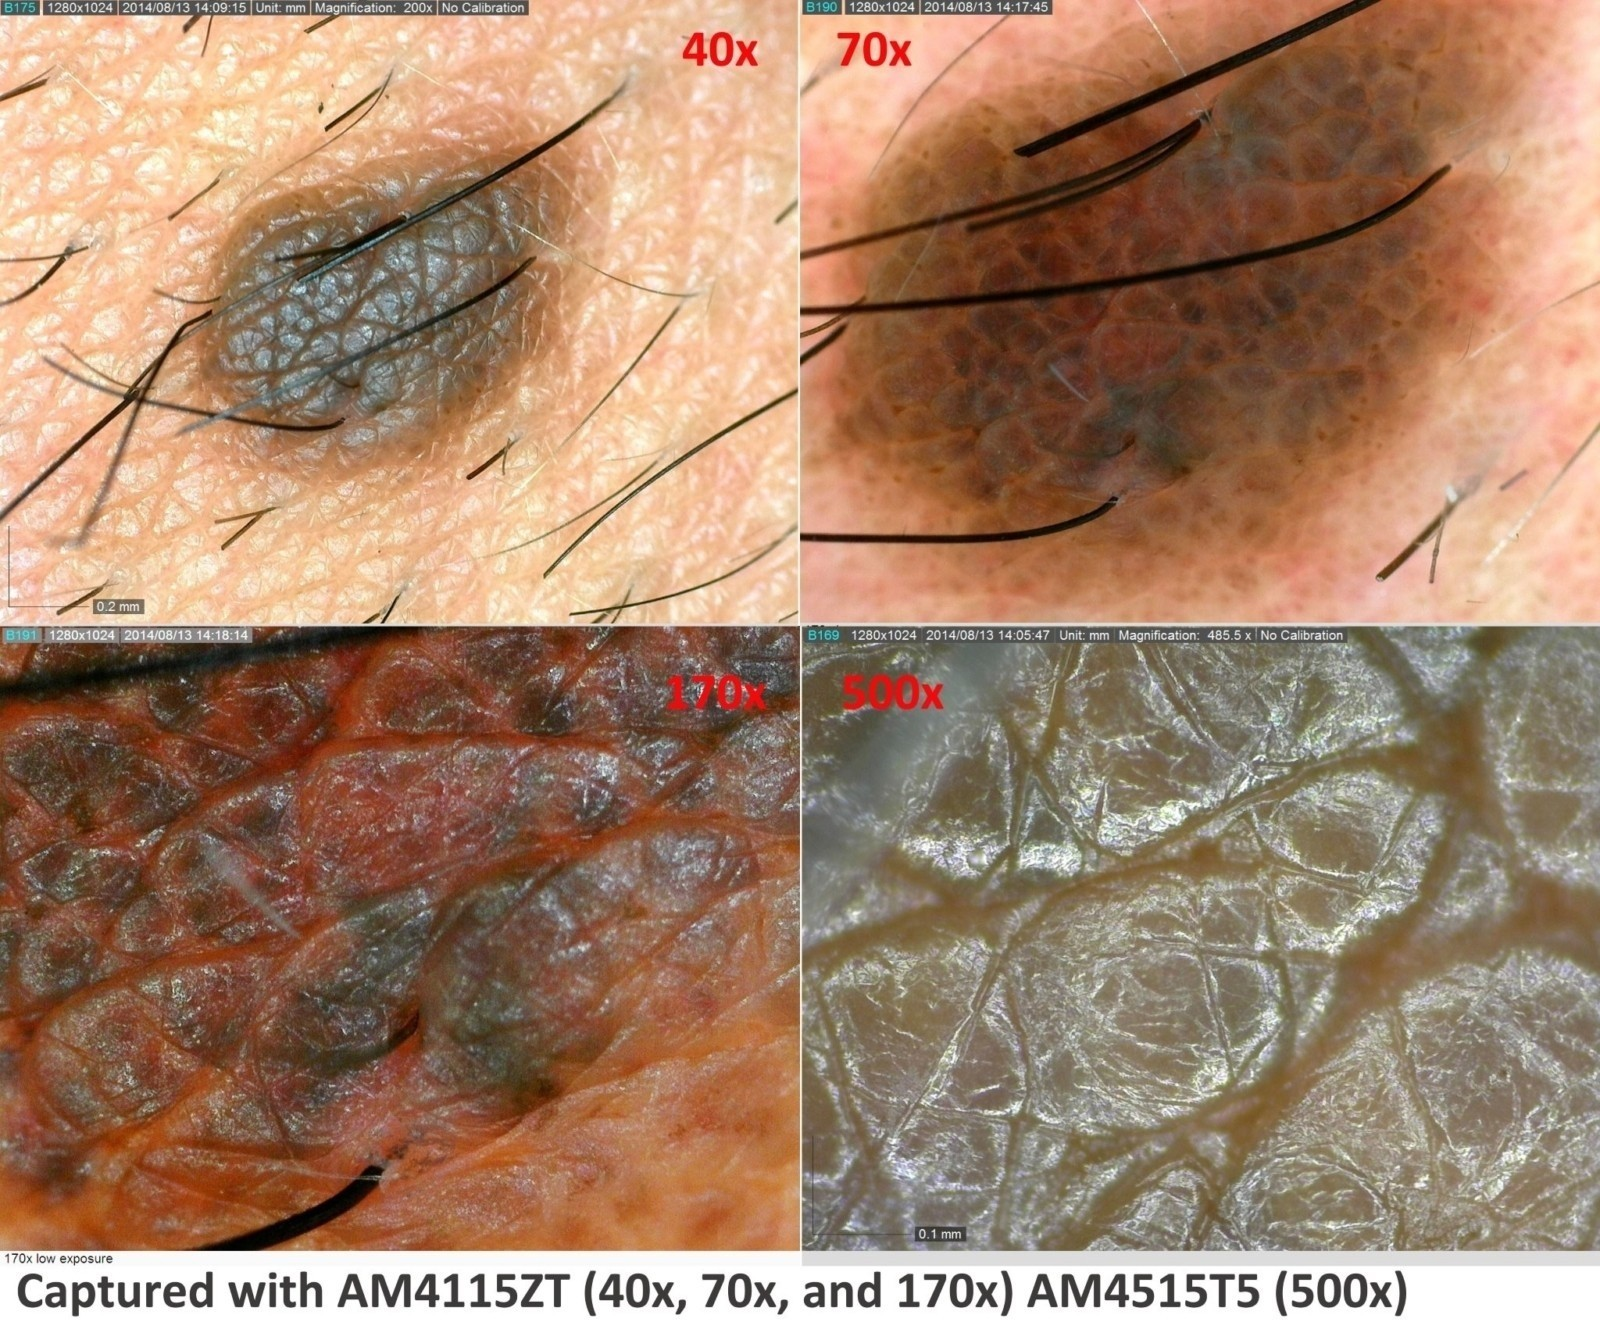 dermatology_09r